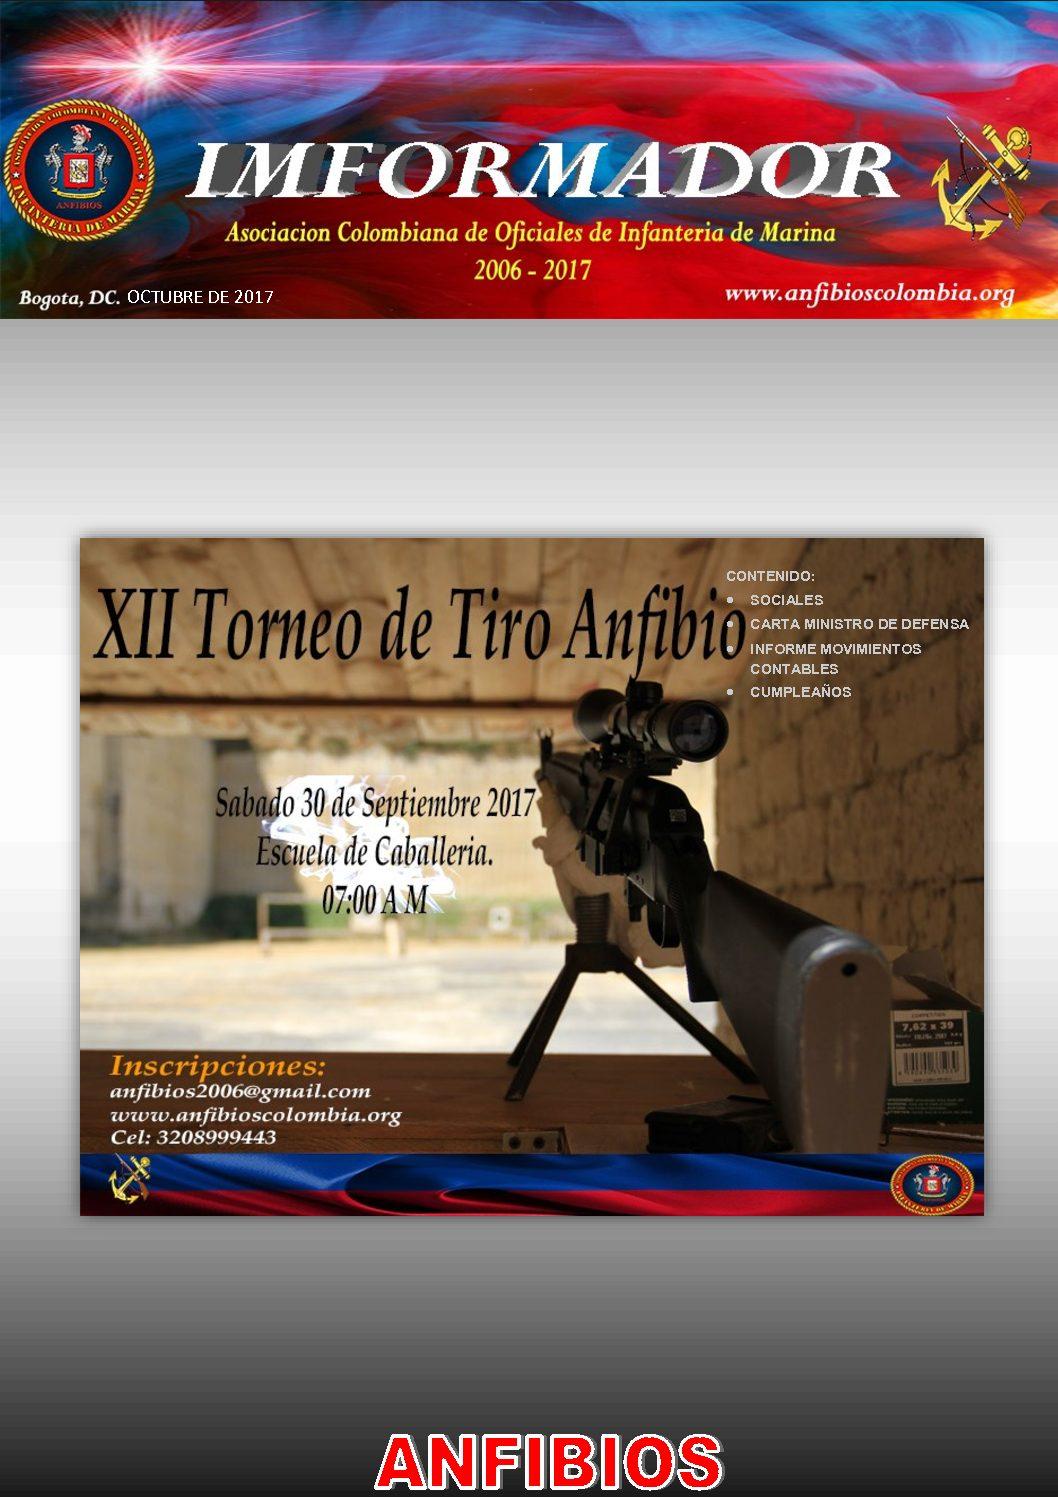 IMFORMADOR NR. 130 ANFIBIOS